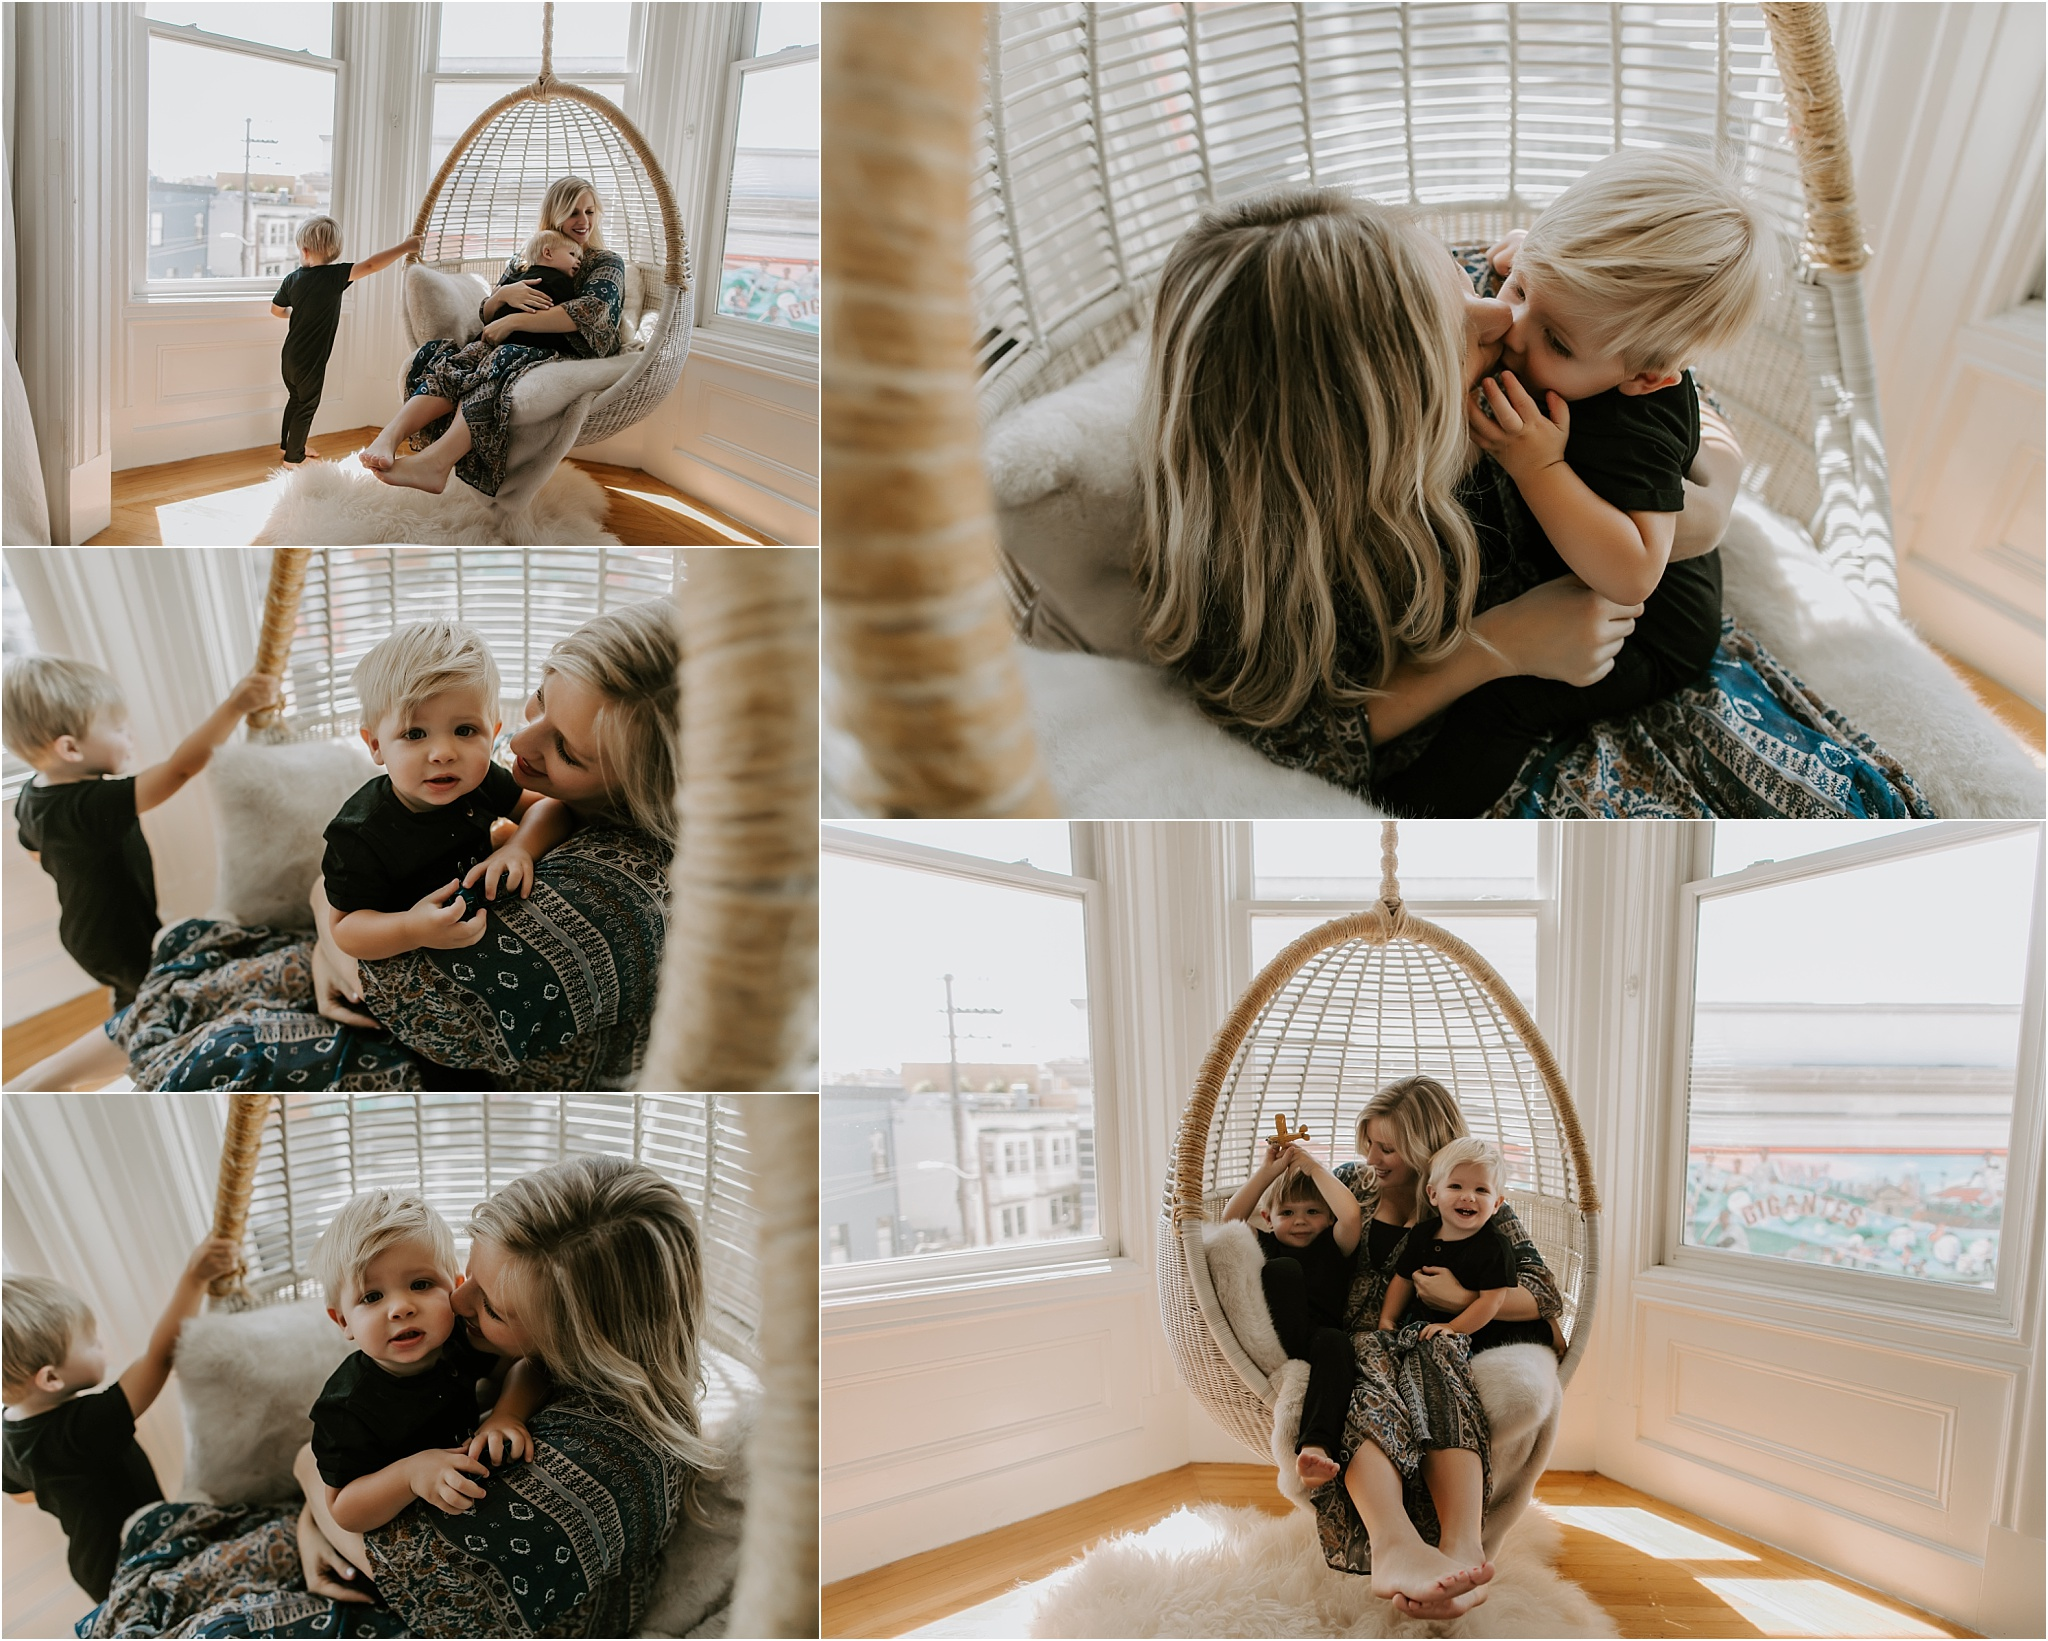 www.daniellenavratilphotography.com #newborn #newbornsession #newbornphotography #daniellenavratilphotography #sonomacountynewbornphotographer #baby #familysession #family